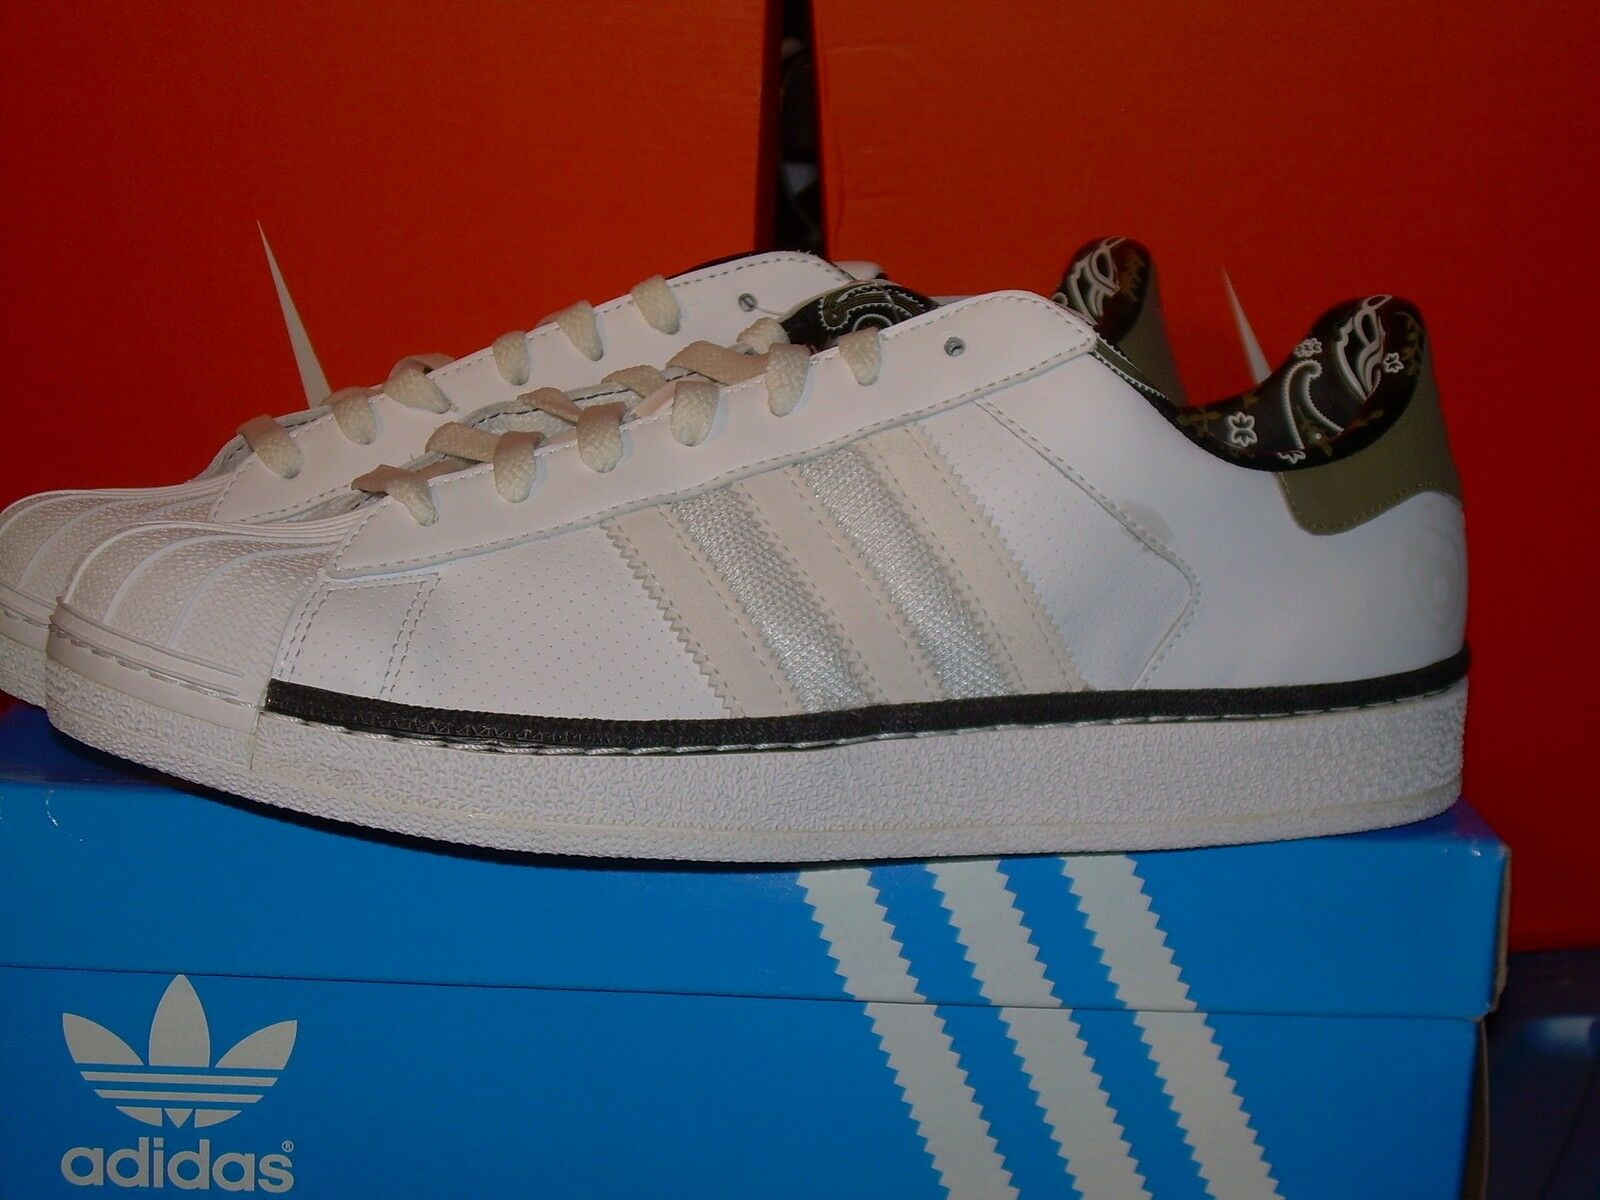 Adidas originali superstar def ii pt young jeezy def superstar jam raro noi 8 pennino. 30c43d